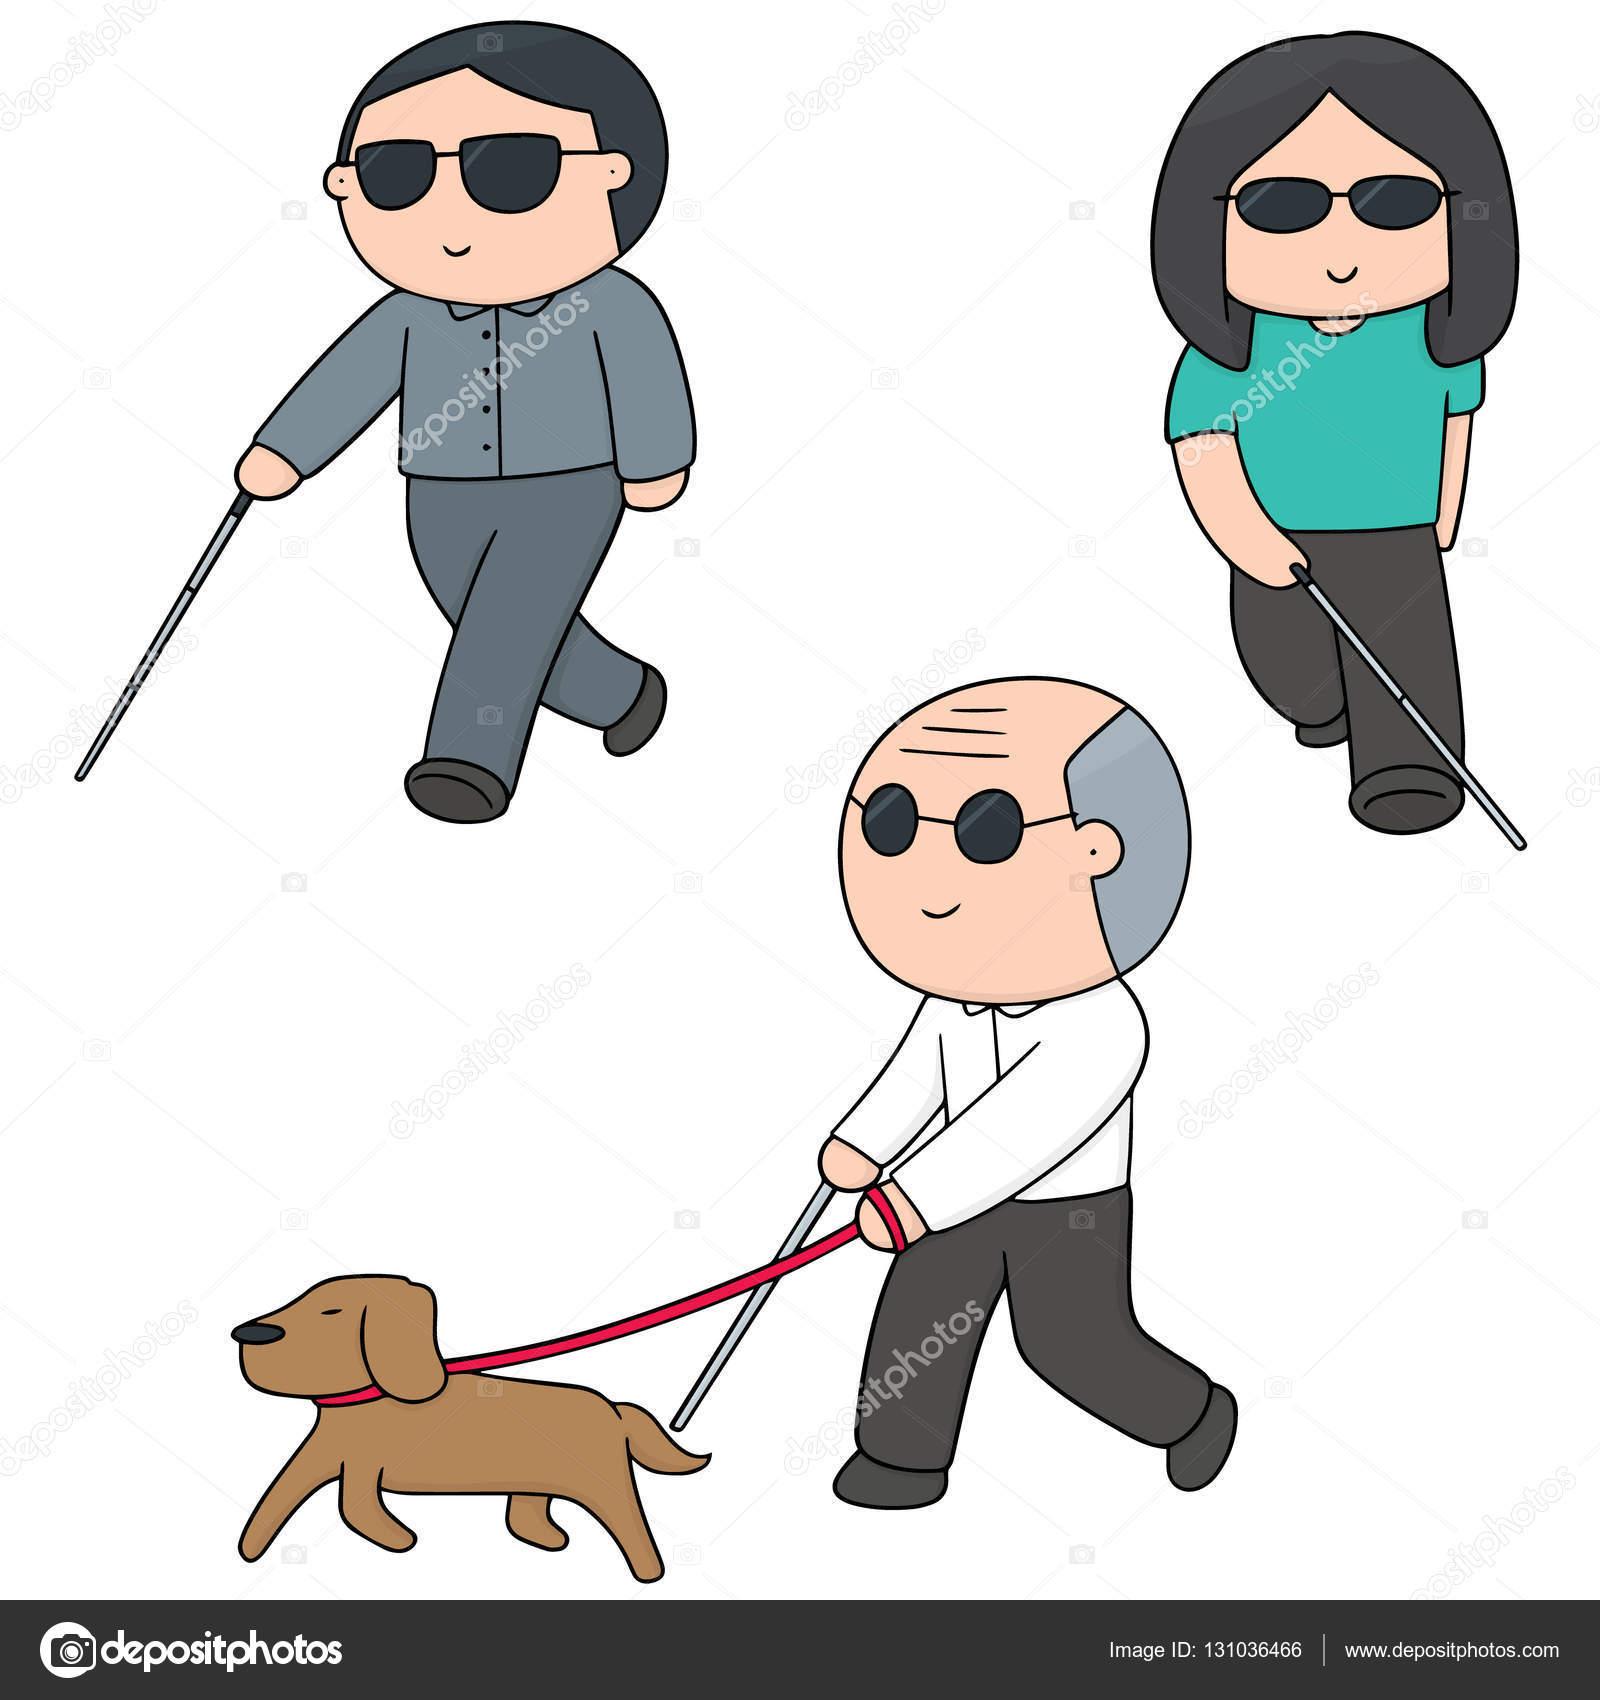 Vektor sadu slepí lidé — Stock Vektor © ourlifelooklikeballoon.